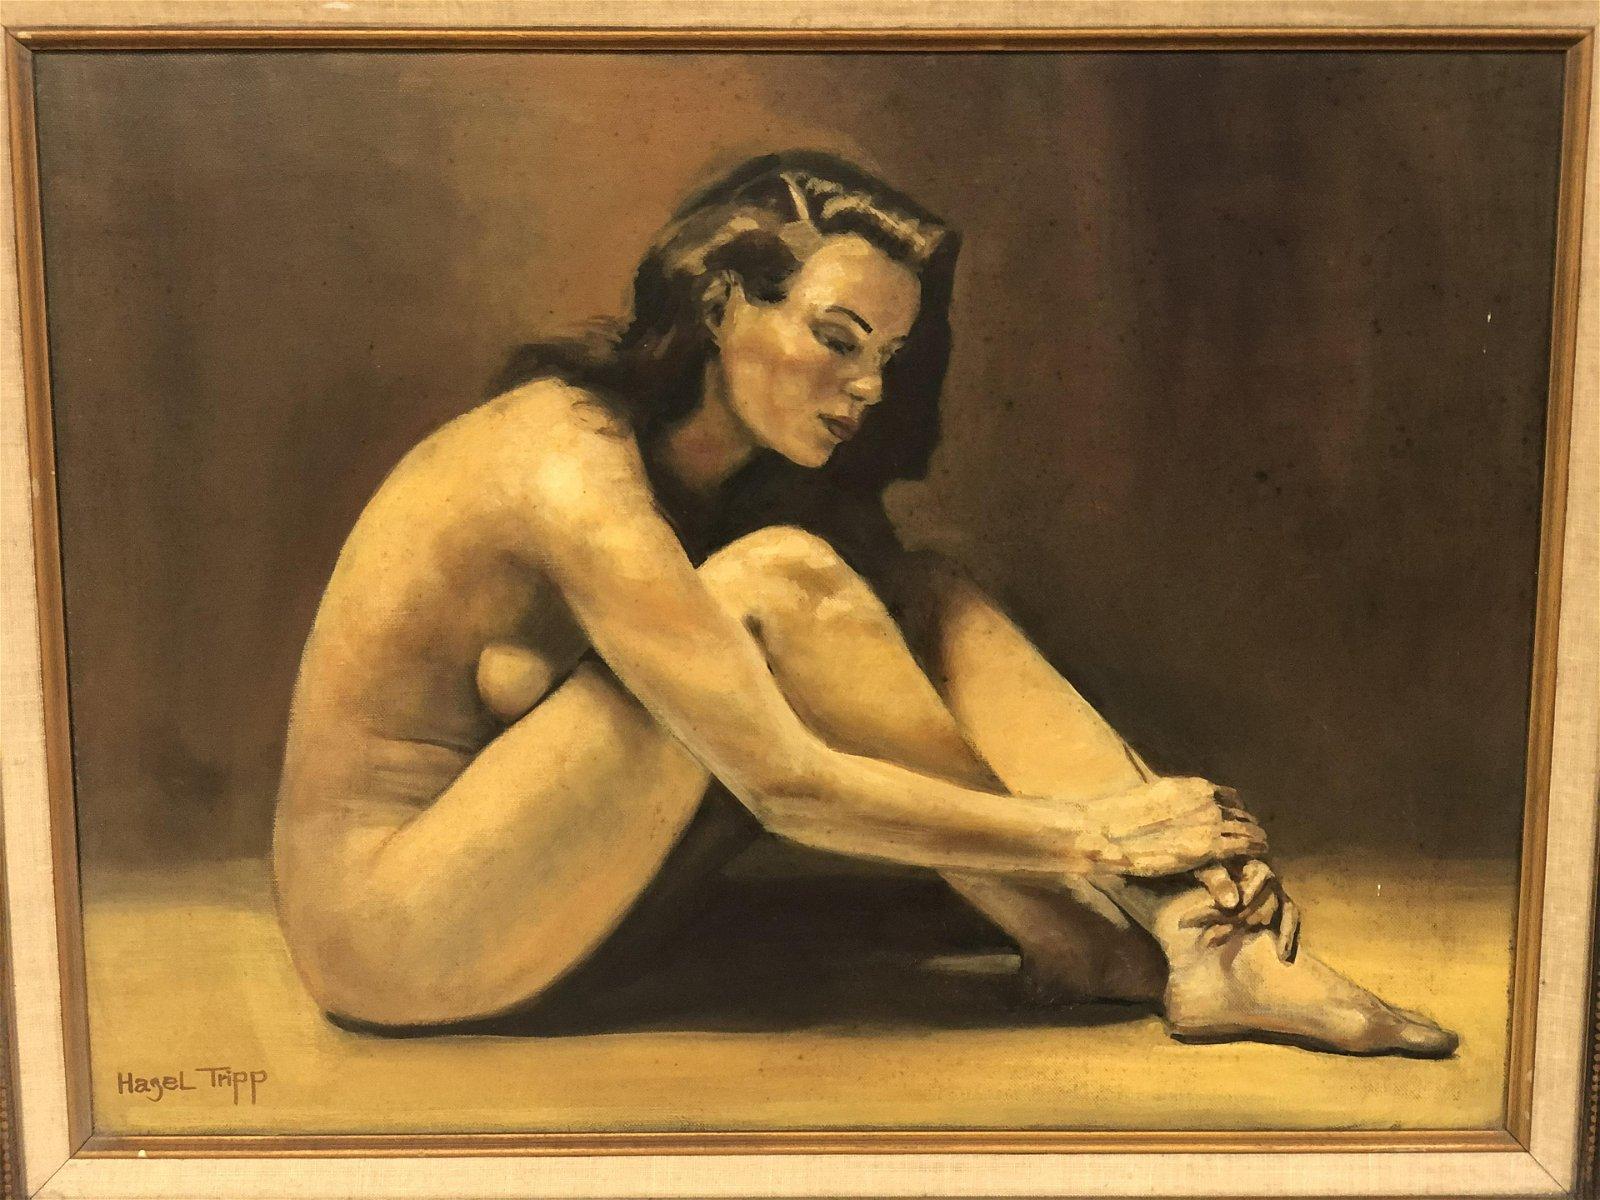 CA Artist, 'Hazel Tripp' Nude on Canvas